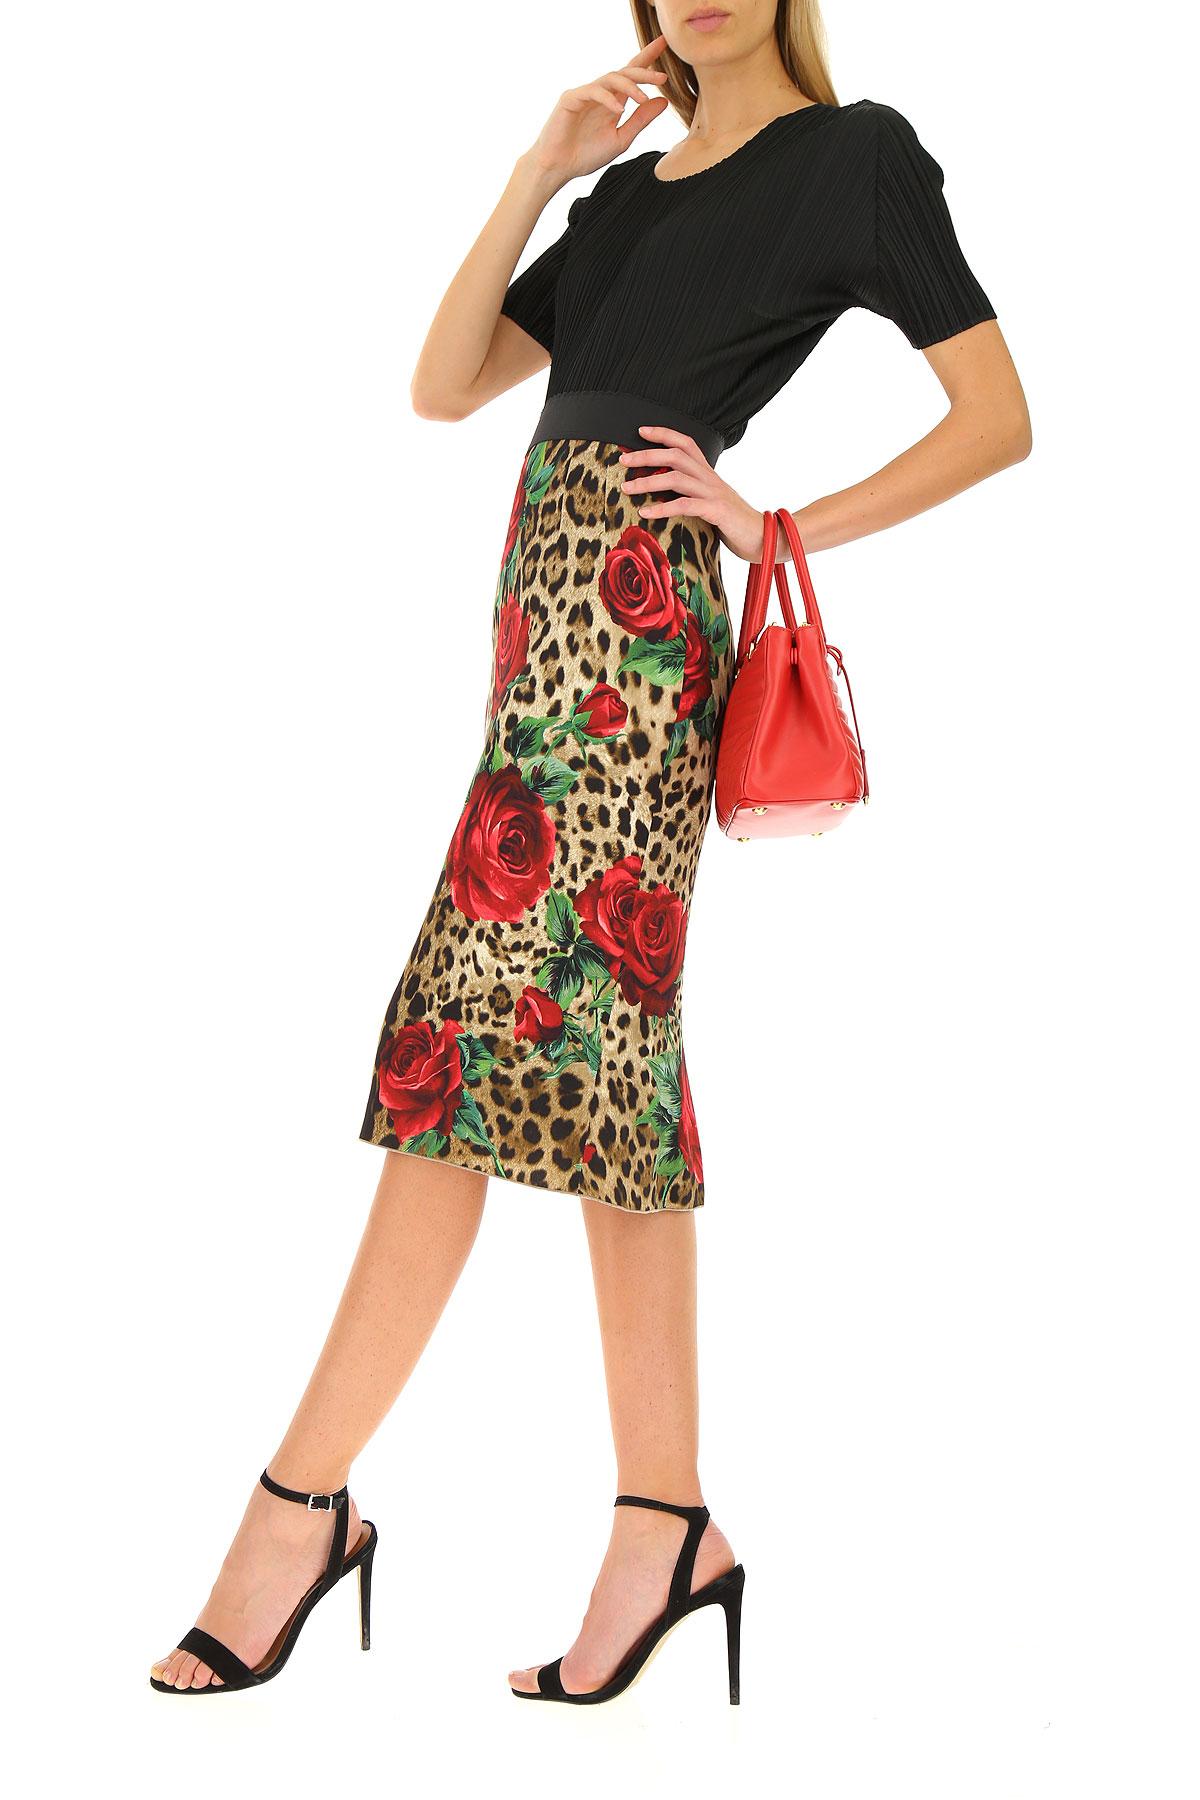 Primavera Gabbana Rojo nbsp;verde amp; 2019 Mujer Dolce Ropa Leopardo verano Para nq1BXAxf